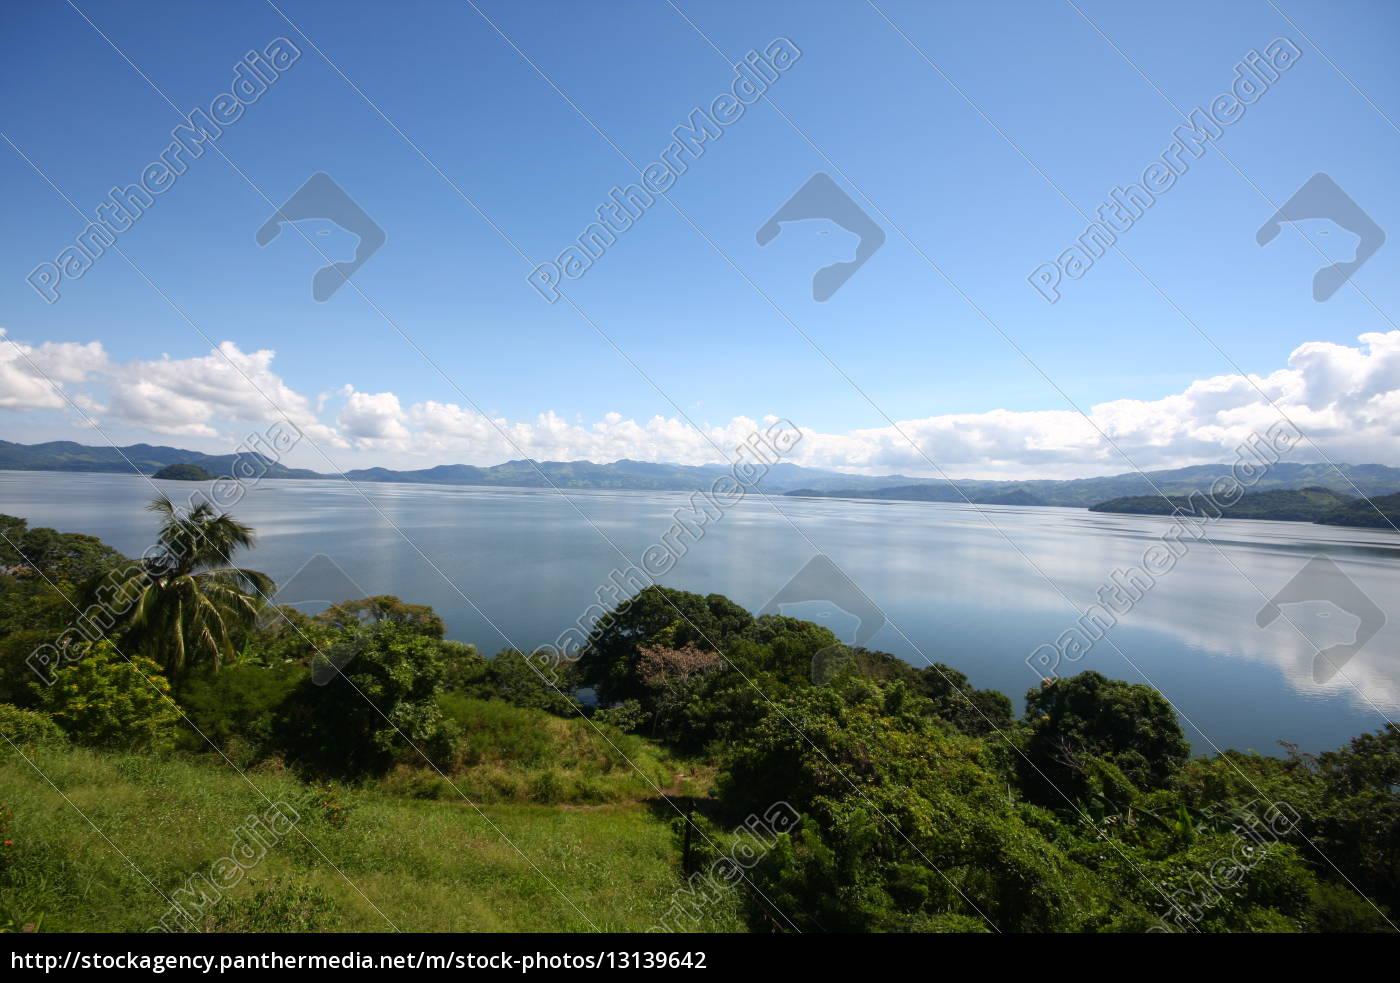 Mexiko, See, Gewässer, Himmel, Wolken, Panorama - 13139642